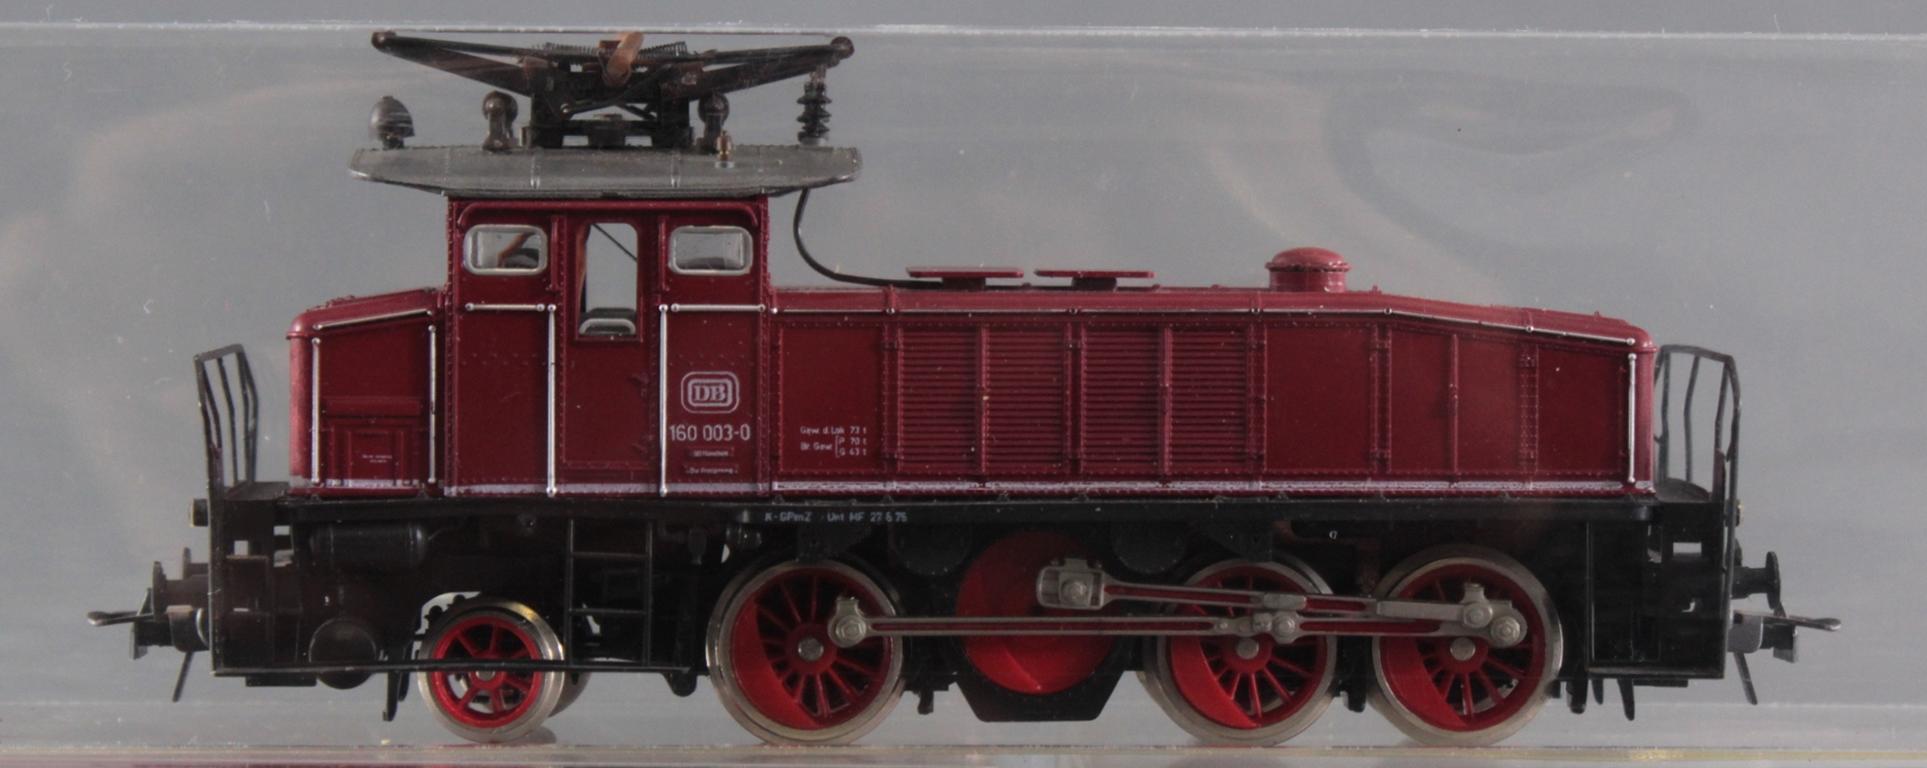 Roco HO E-Lok 160 003-0  mit 6 Fleischmann Güterwaggons-2